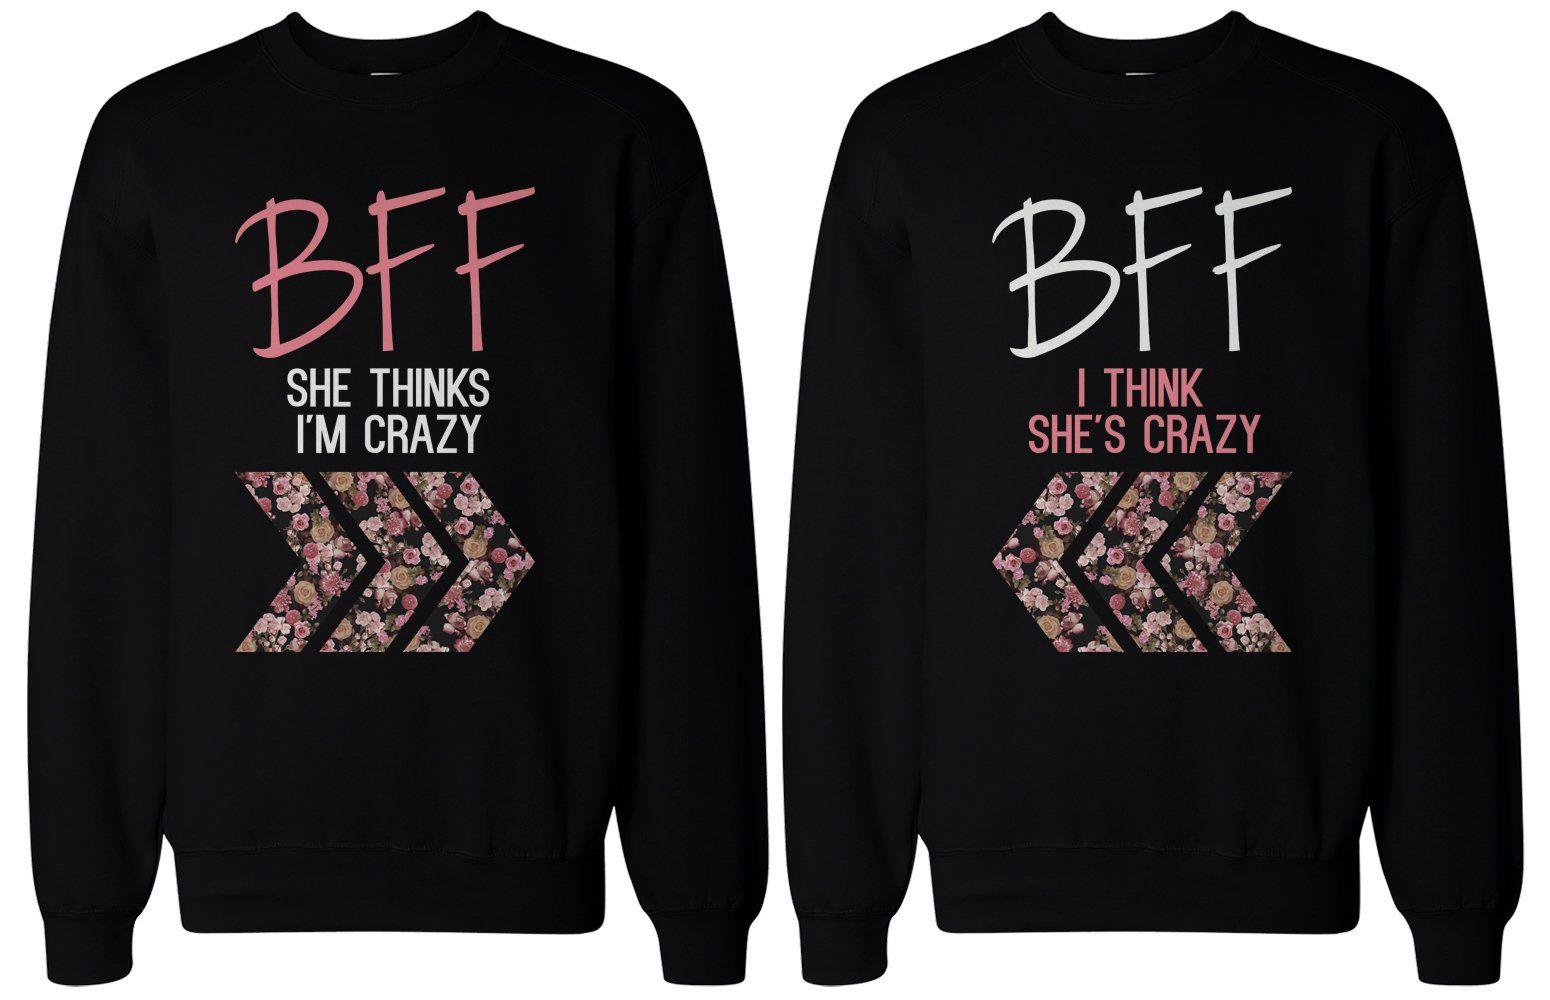 Mother Daughter Quotes Wallpapers Best 25 Best Friend Sweatshirts Ideas On Pinterest